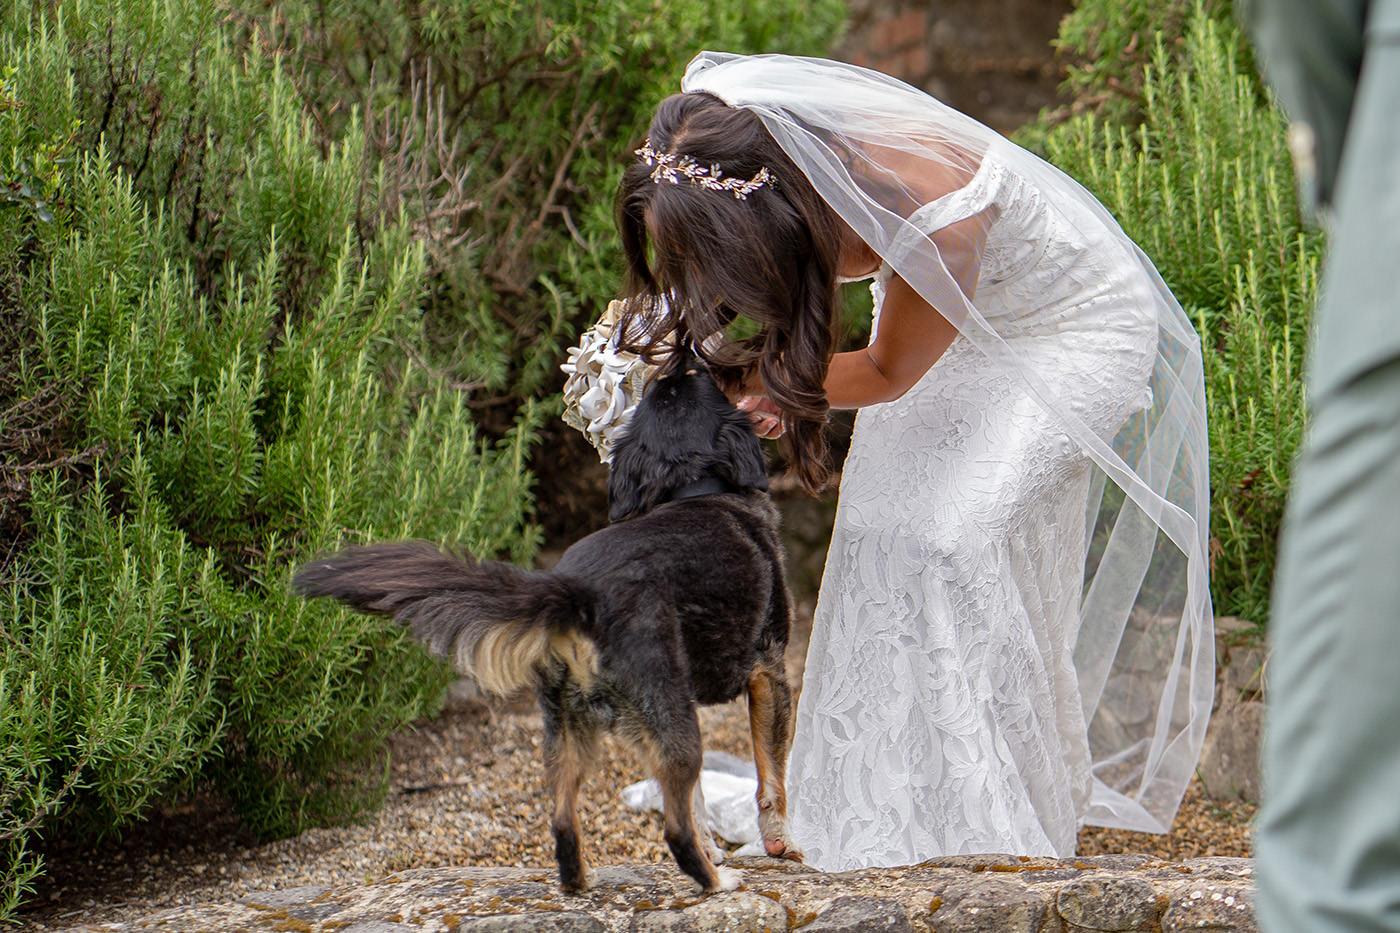 Vows Renewal Photographer in Tuscany - Duccio Argentini